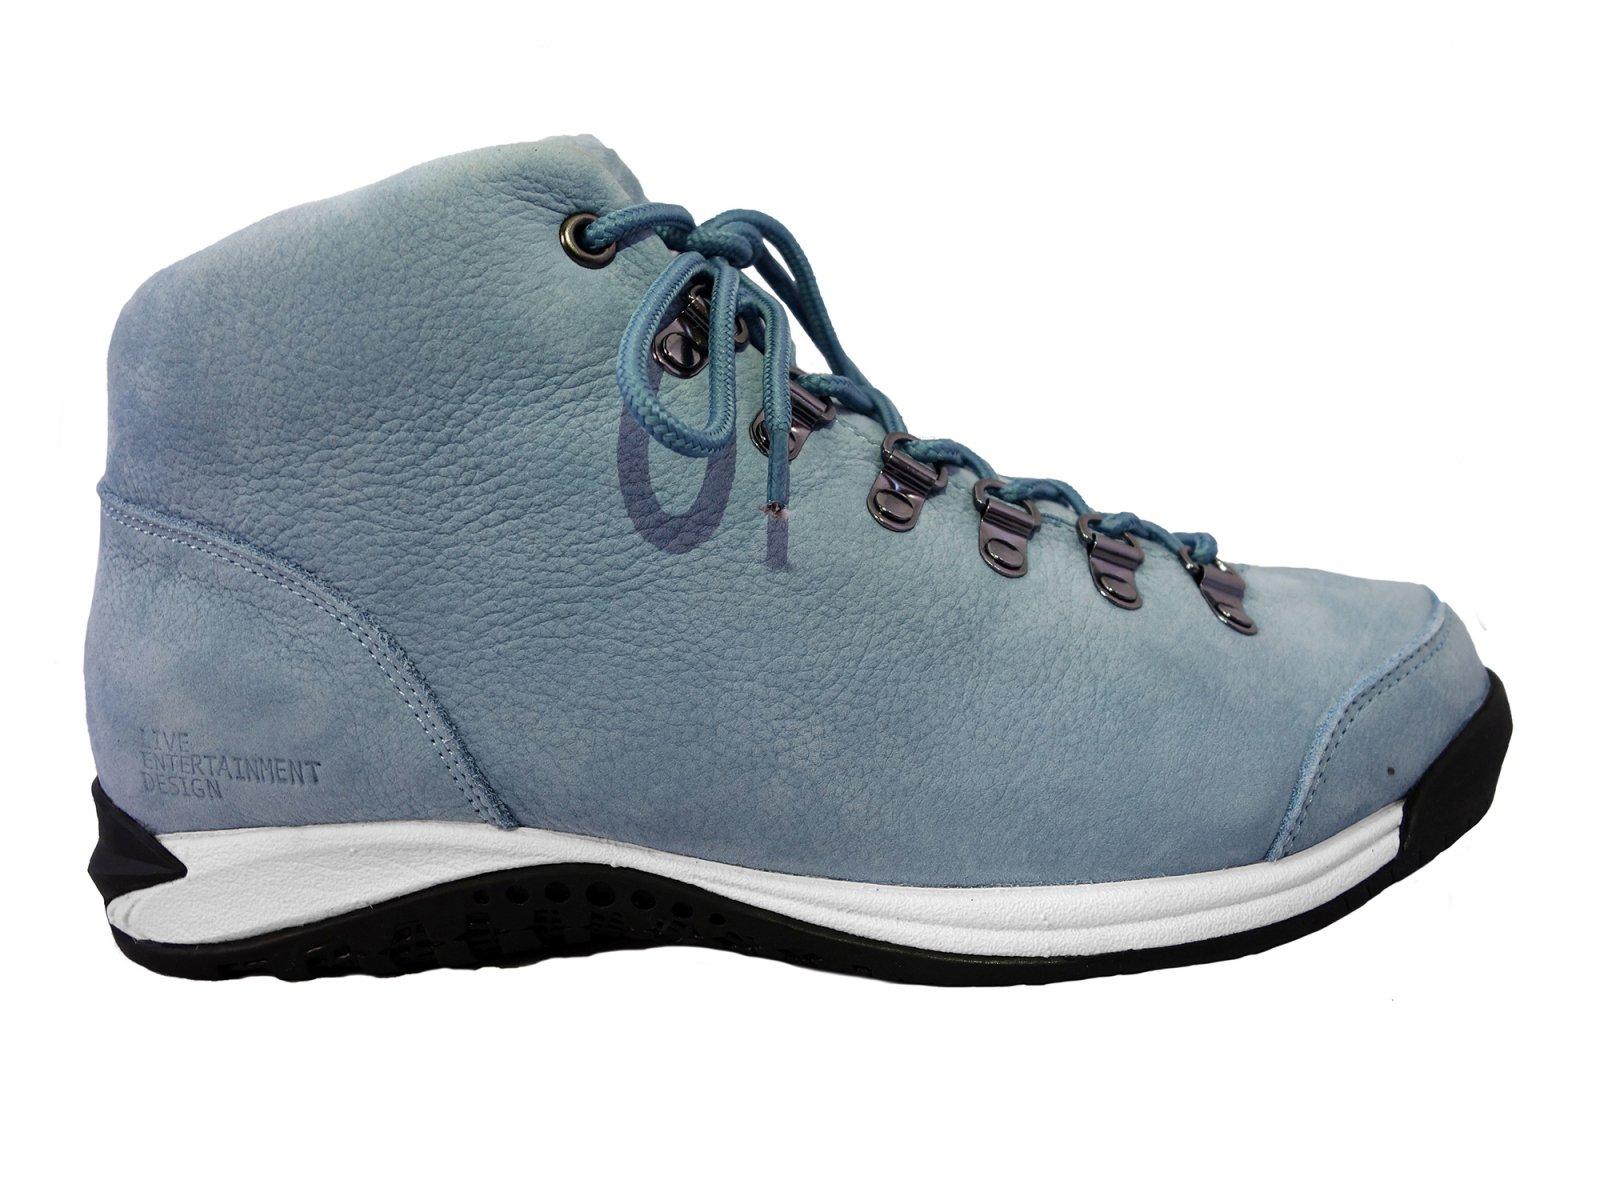 【LIVE ENTERTAINMENT DESIGN】Vibram sneaker boots  (Shrink nubuck leather Light blue)